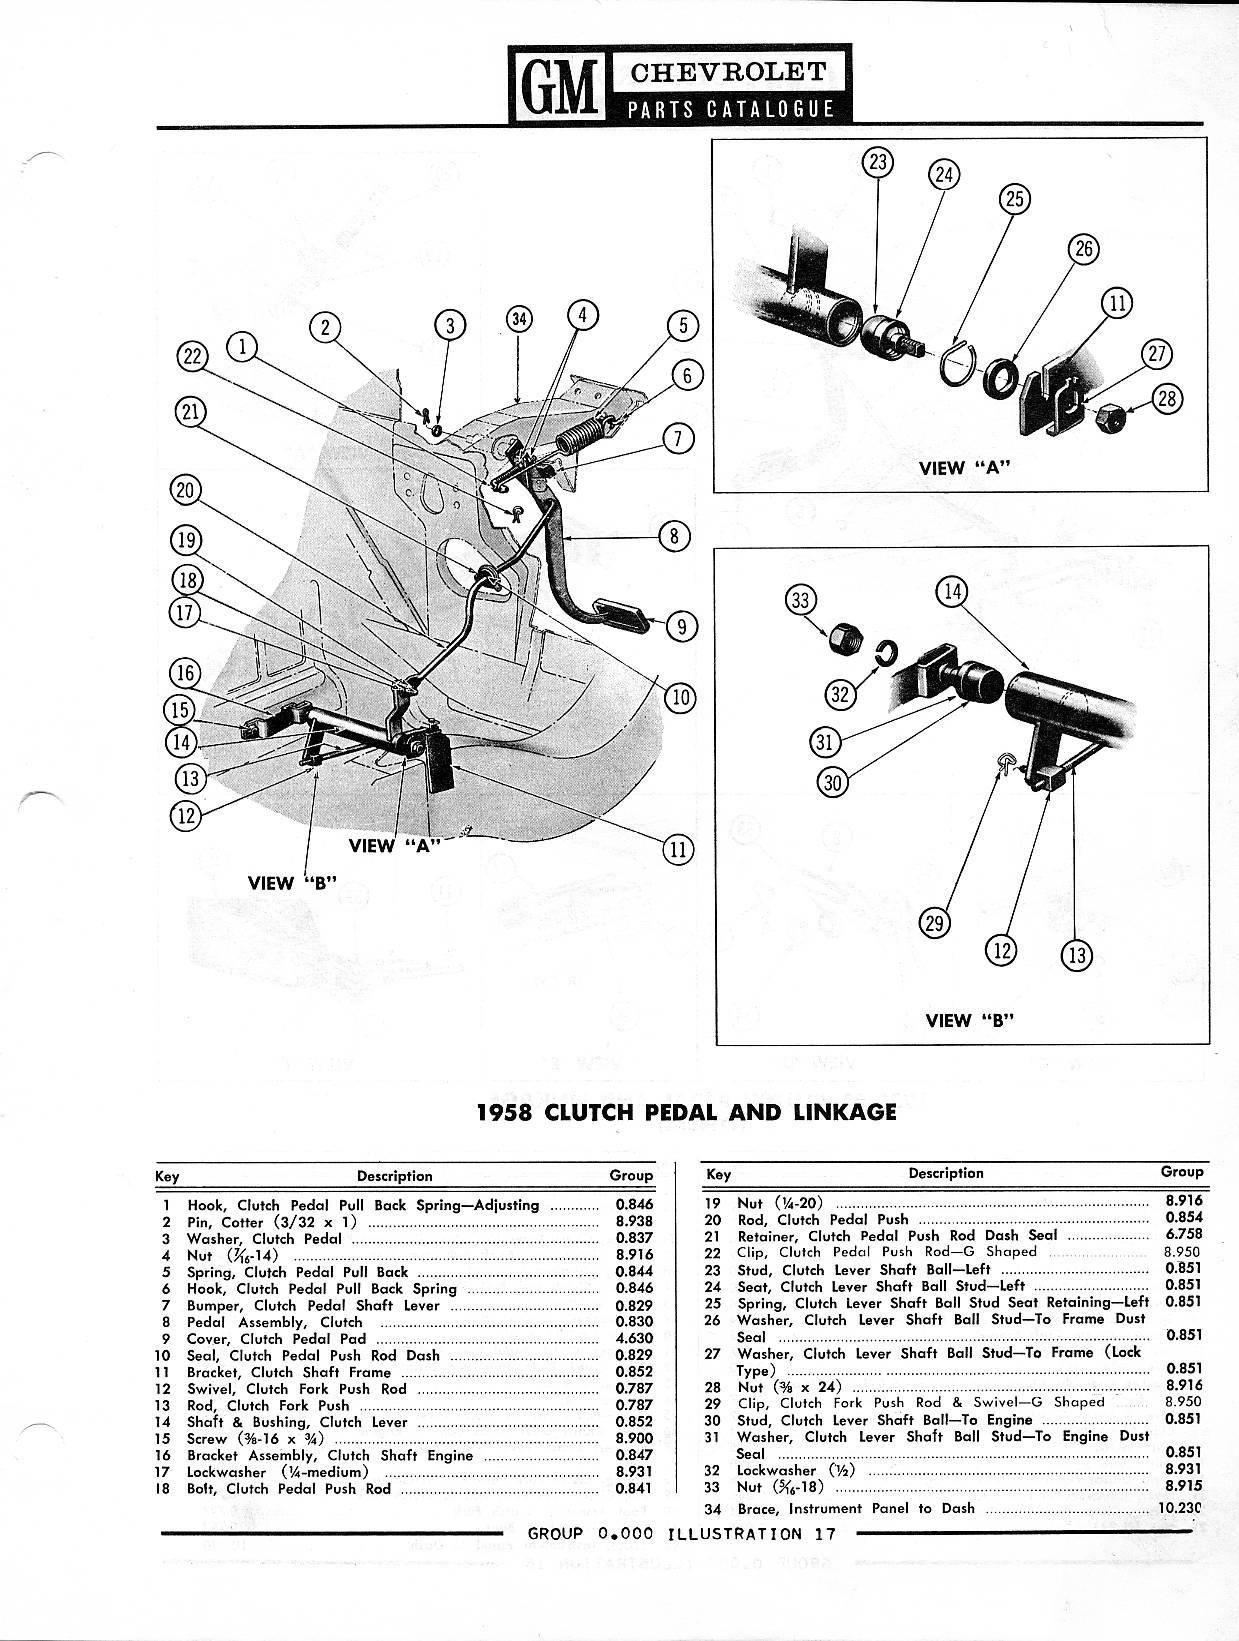 Chevrolet Parts Catalog